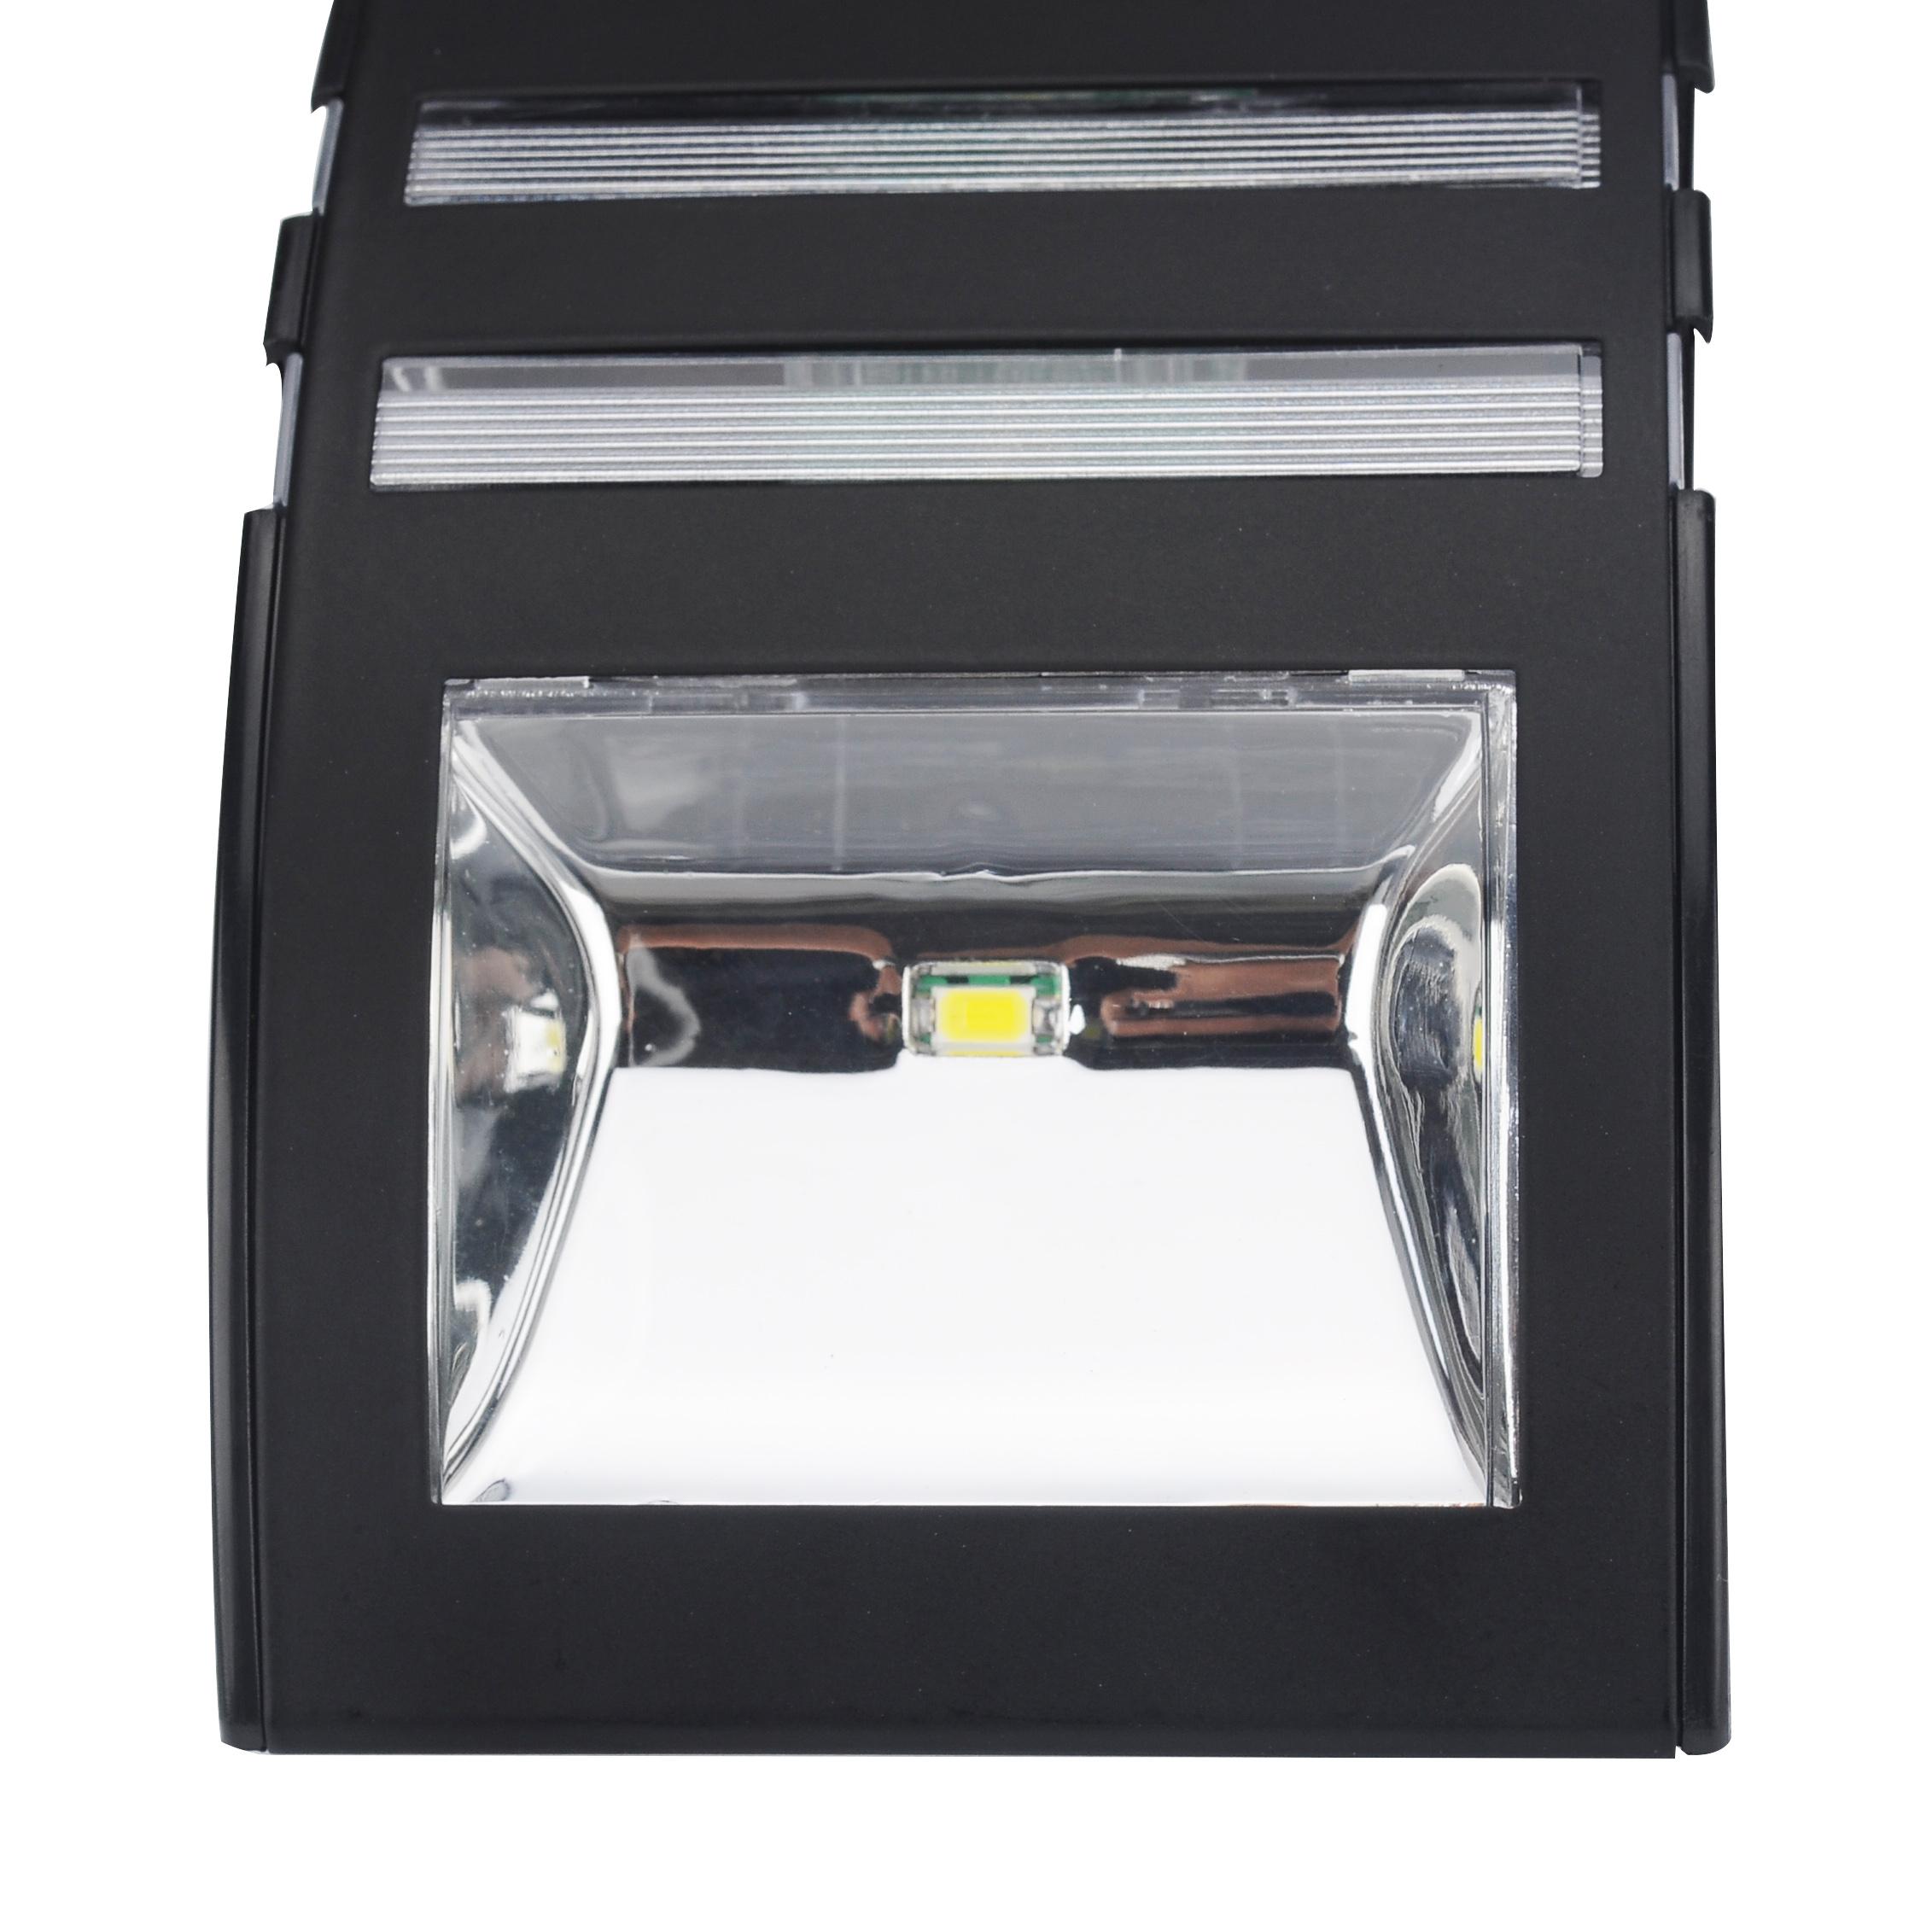 Outdoor Solar Powered Led Security Light 5 5v